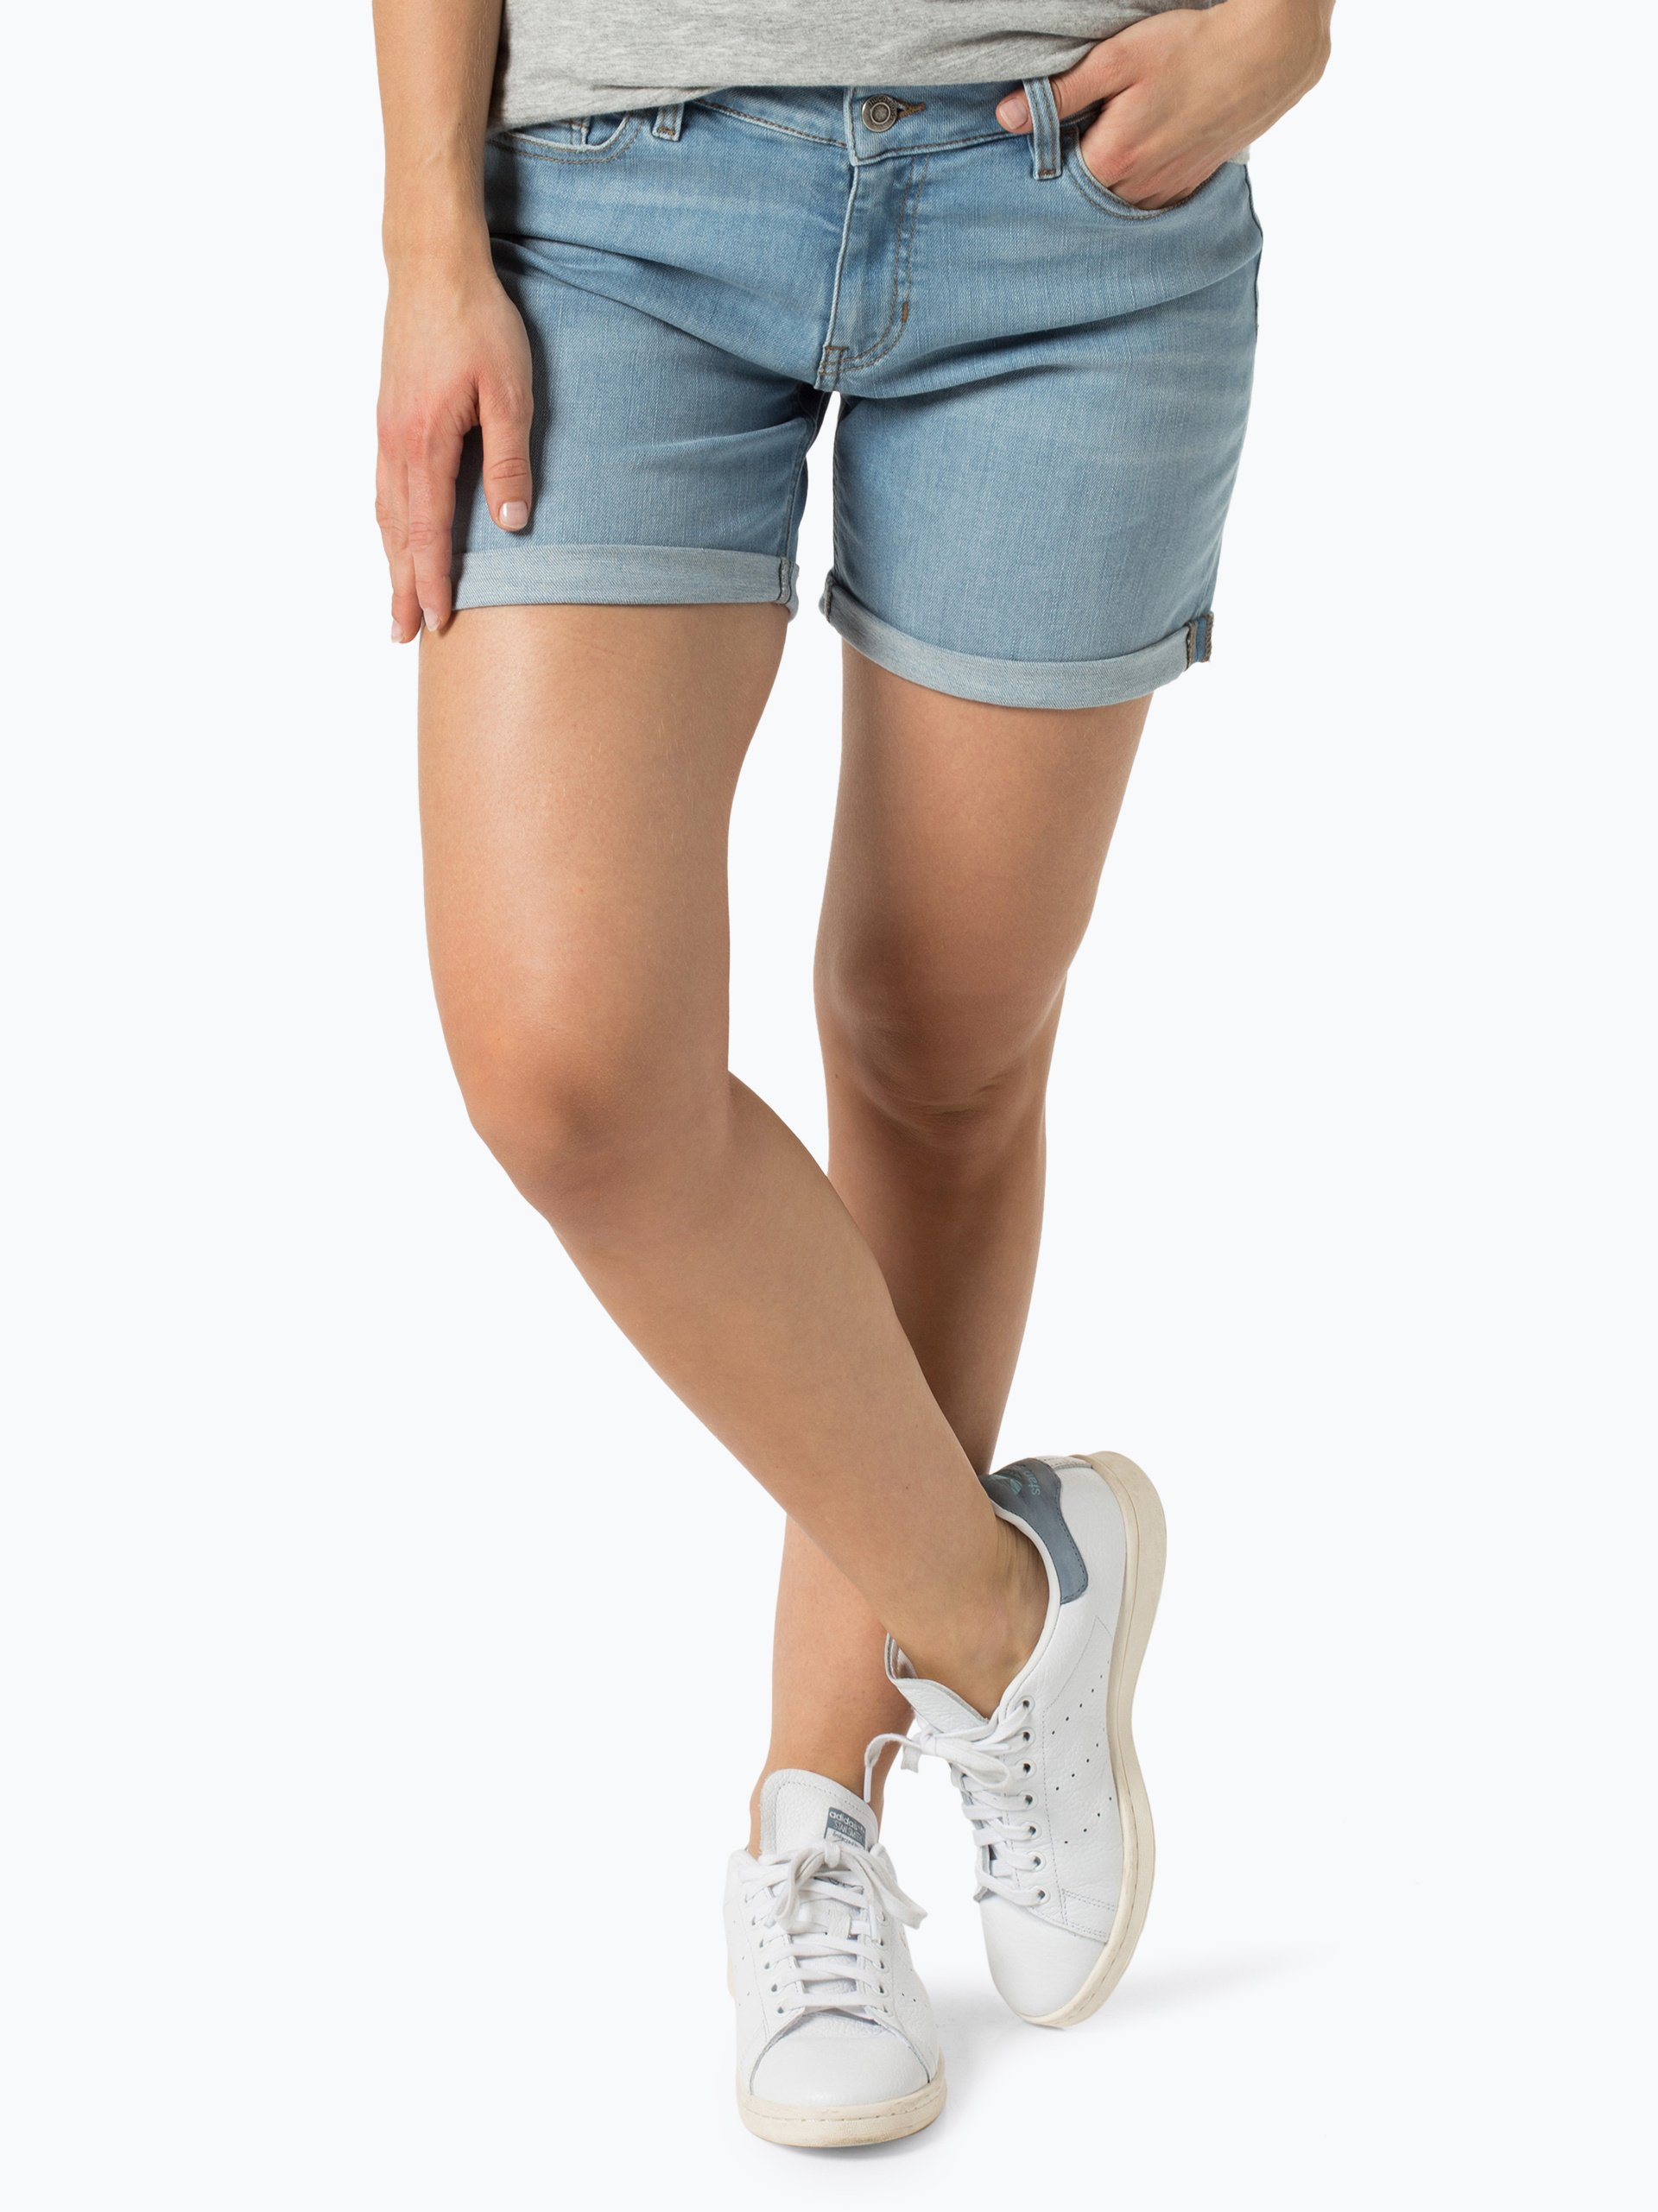 BOSS Casual Damen Jeansshorts - Hershey